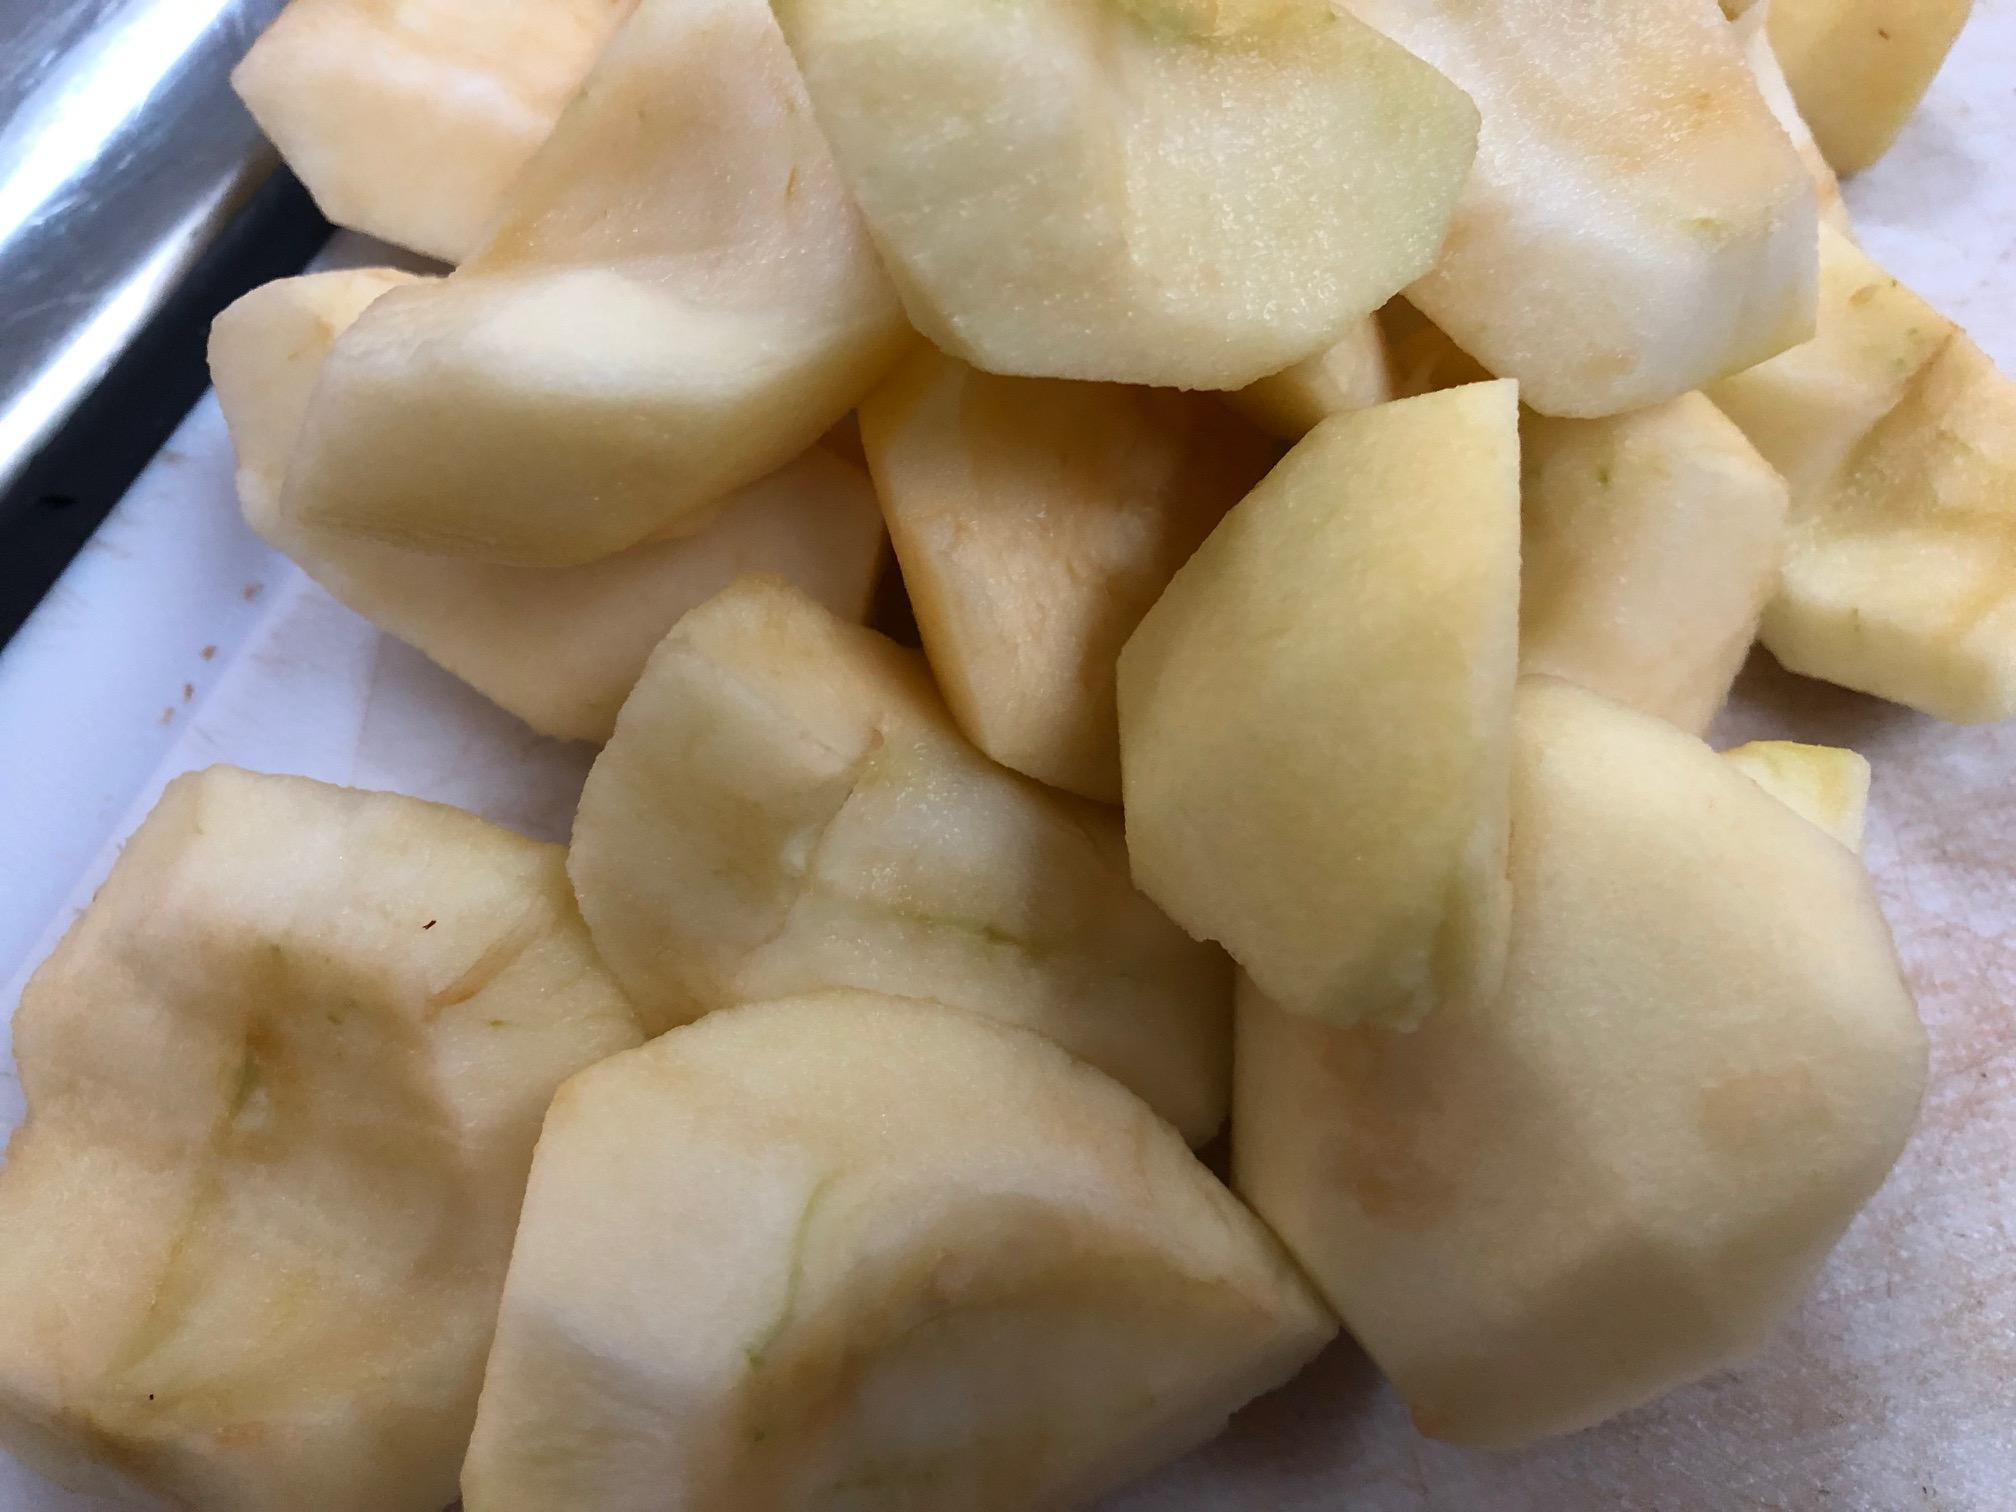 pealed apples